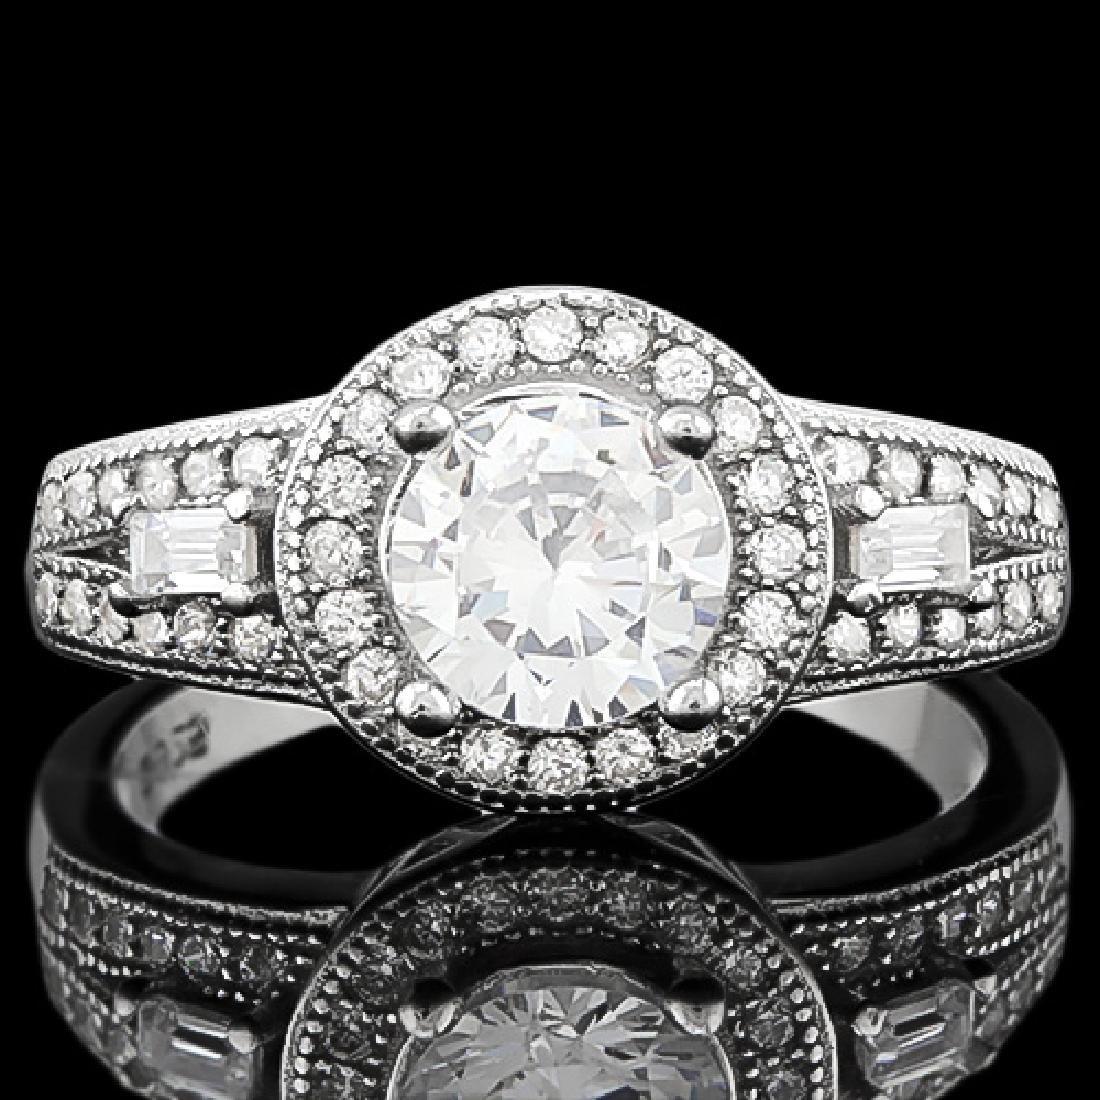 1 CARAT FLAWLESS CREATED DIAMOND 925 STERLING SILVER HA